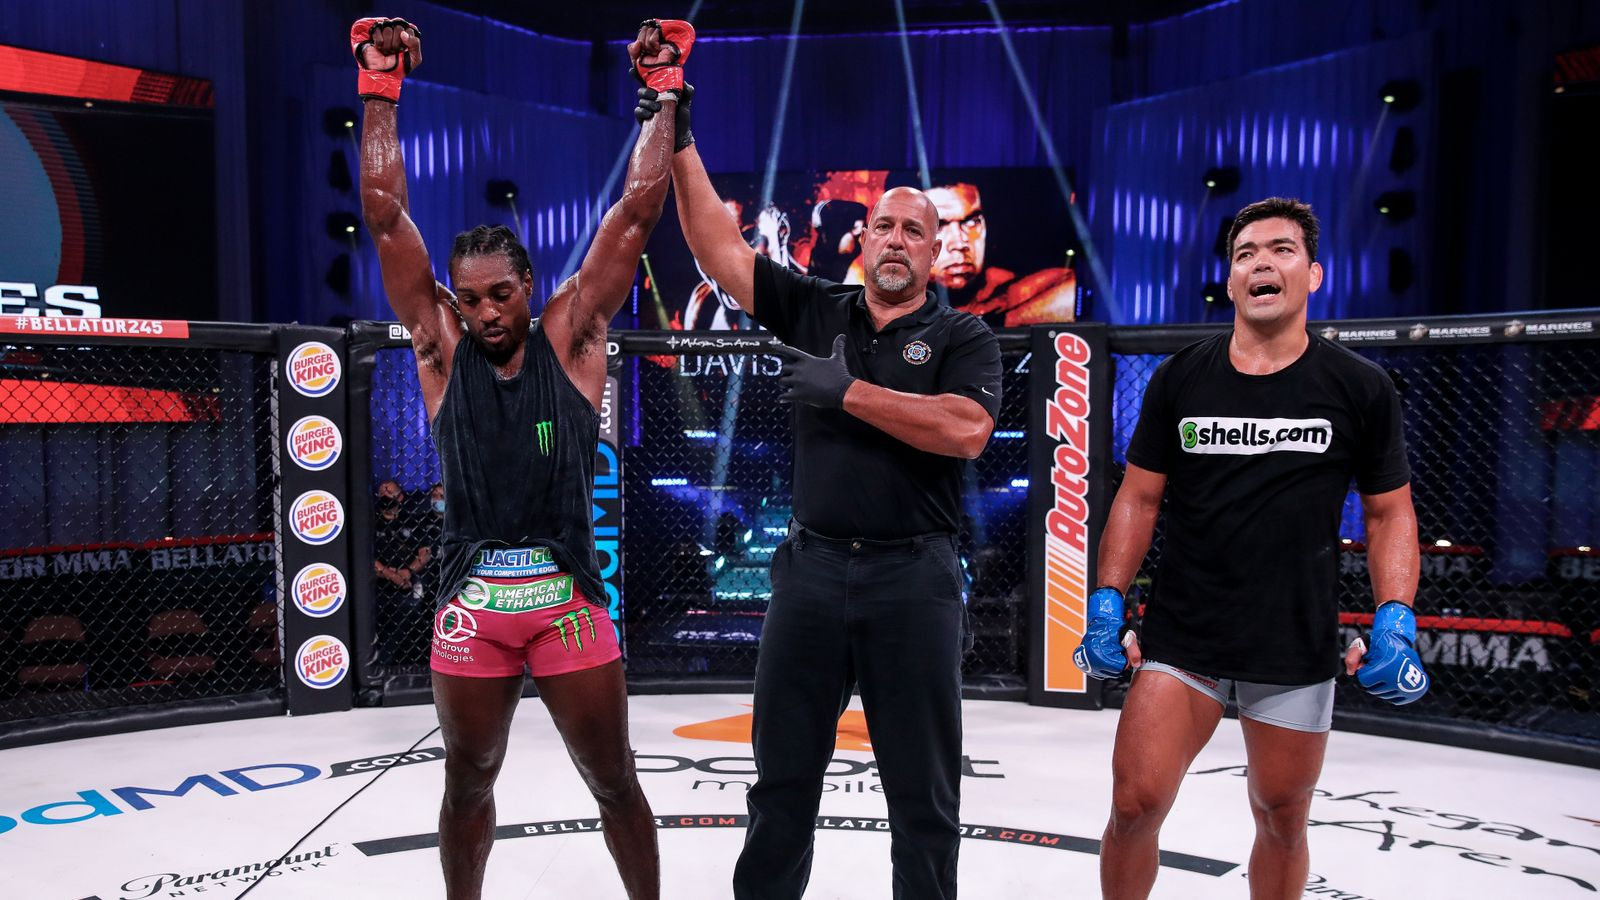 Davis beats Machida in split